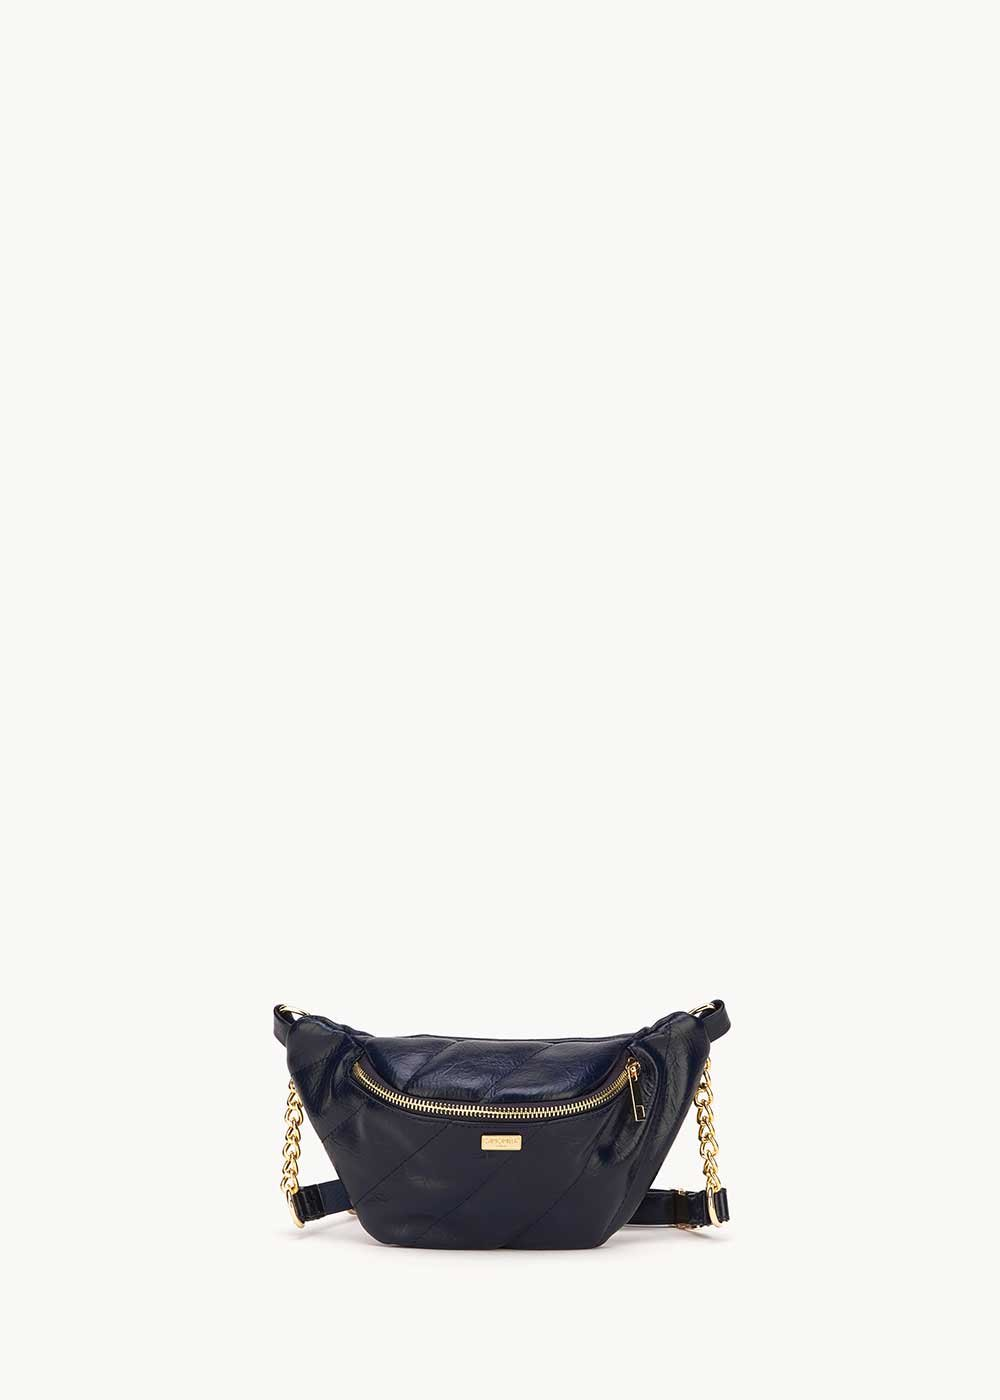 Blesh medium blue bum bag - Medium Blue - Woman